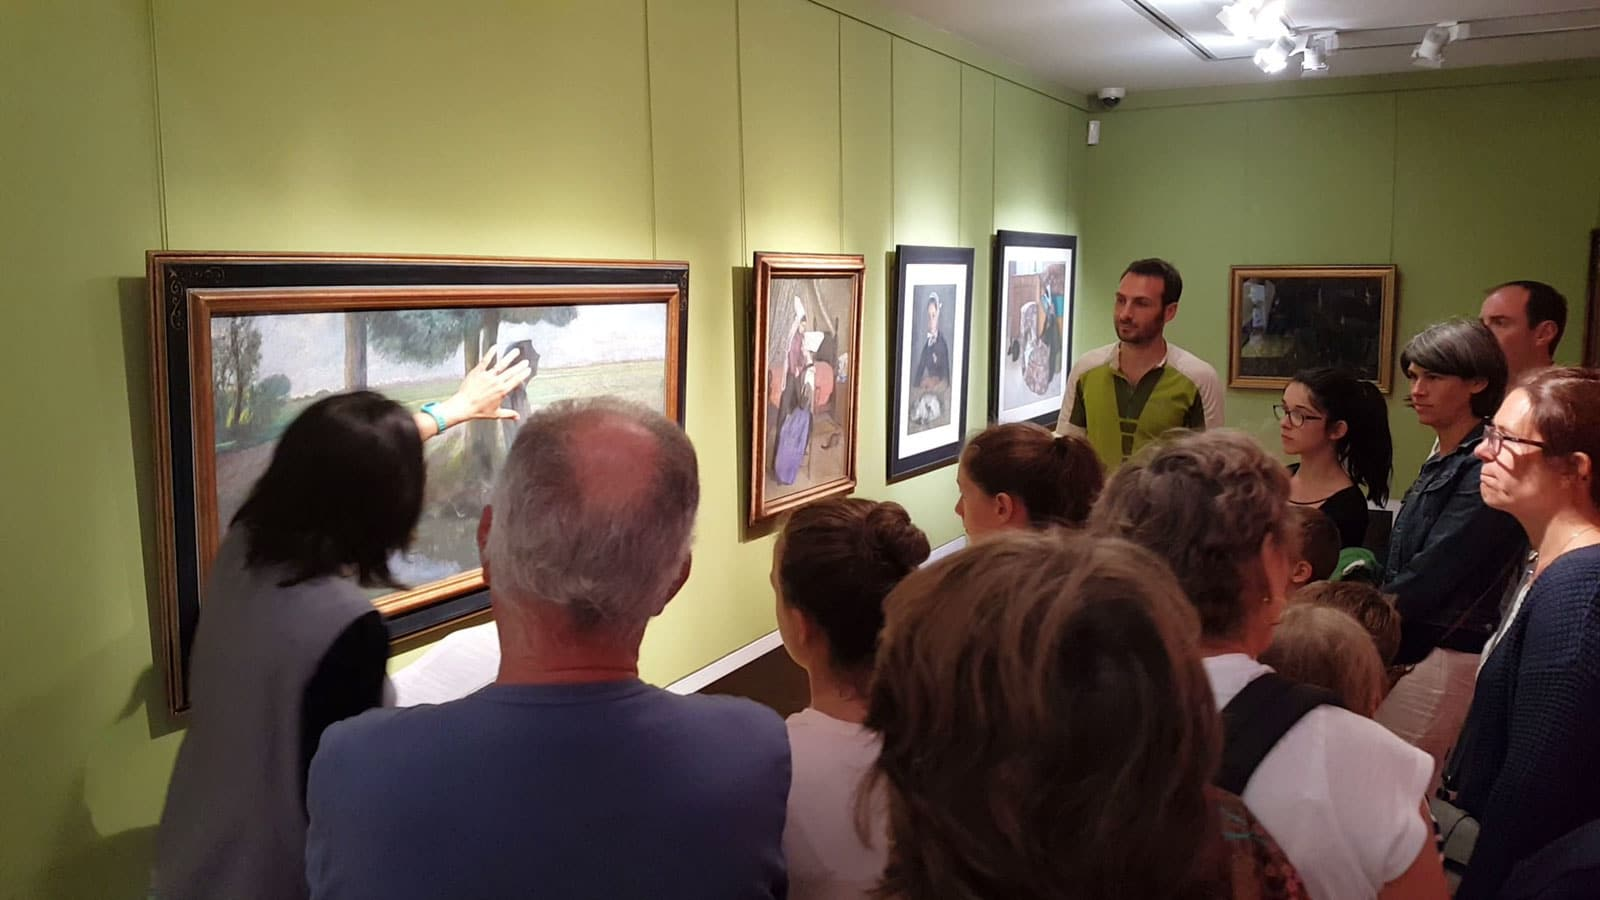 sightseeing-vendee-museum-milcendeau-MARCADE